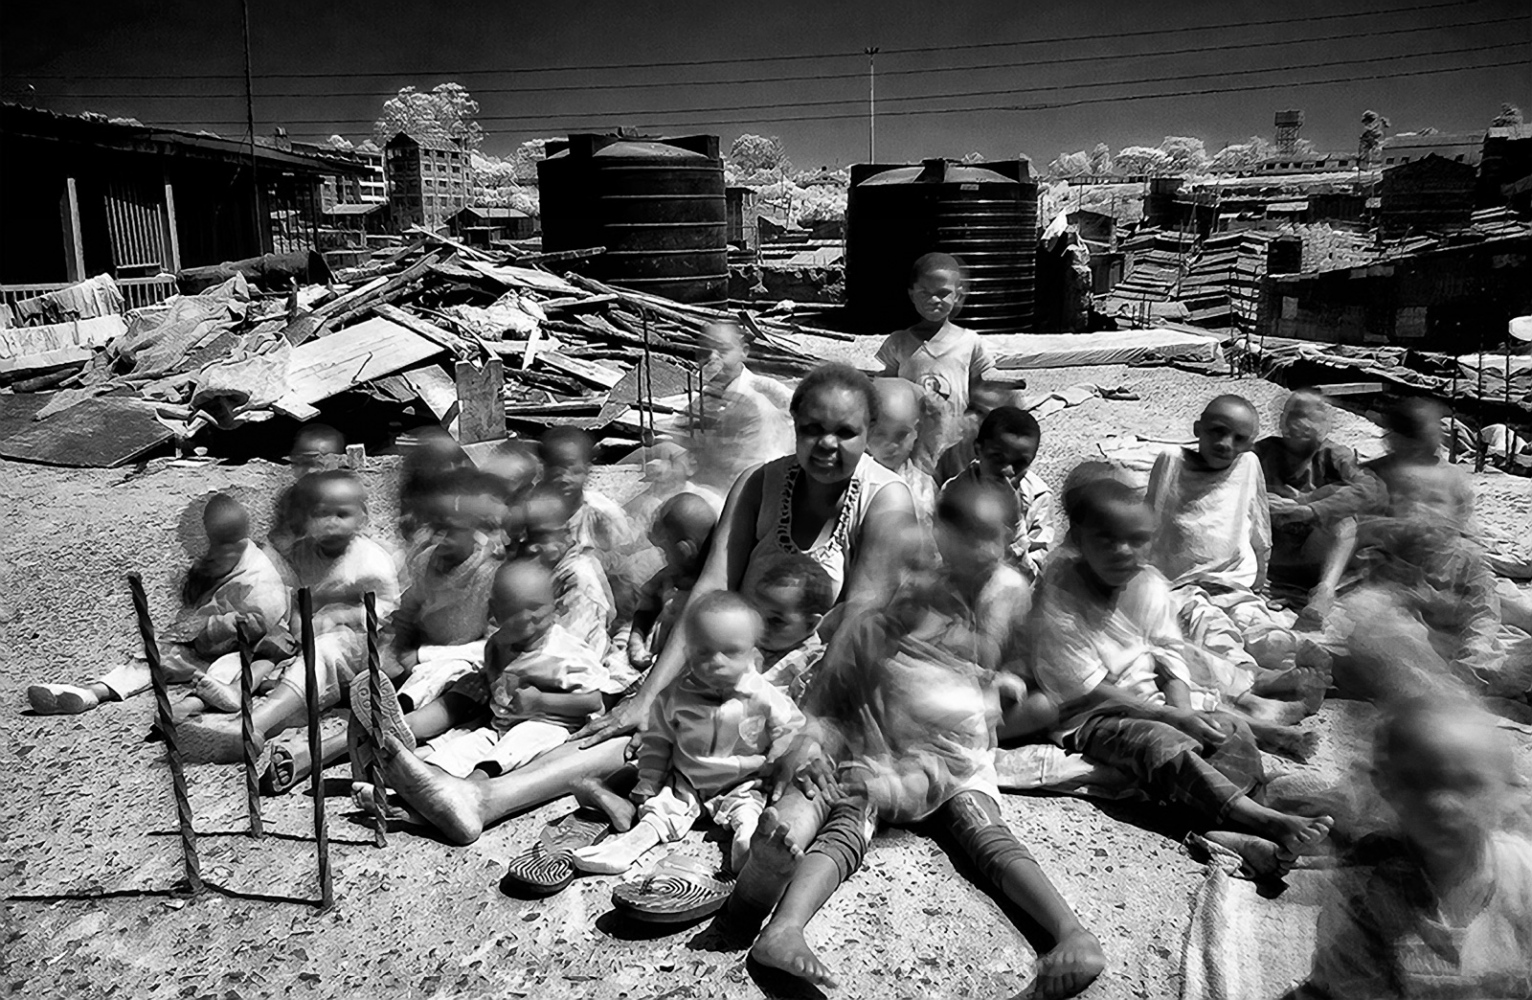 Art and Documentary Photography - Loading BIH_11.jpg